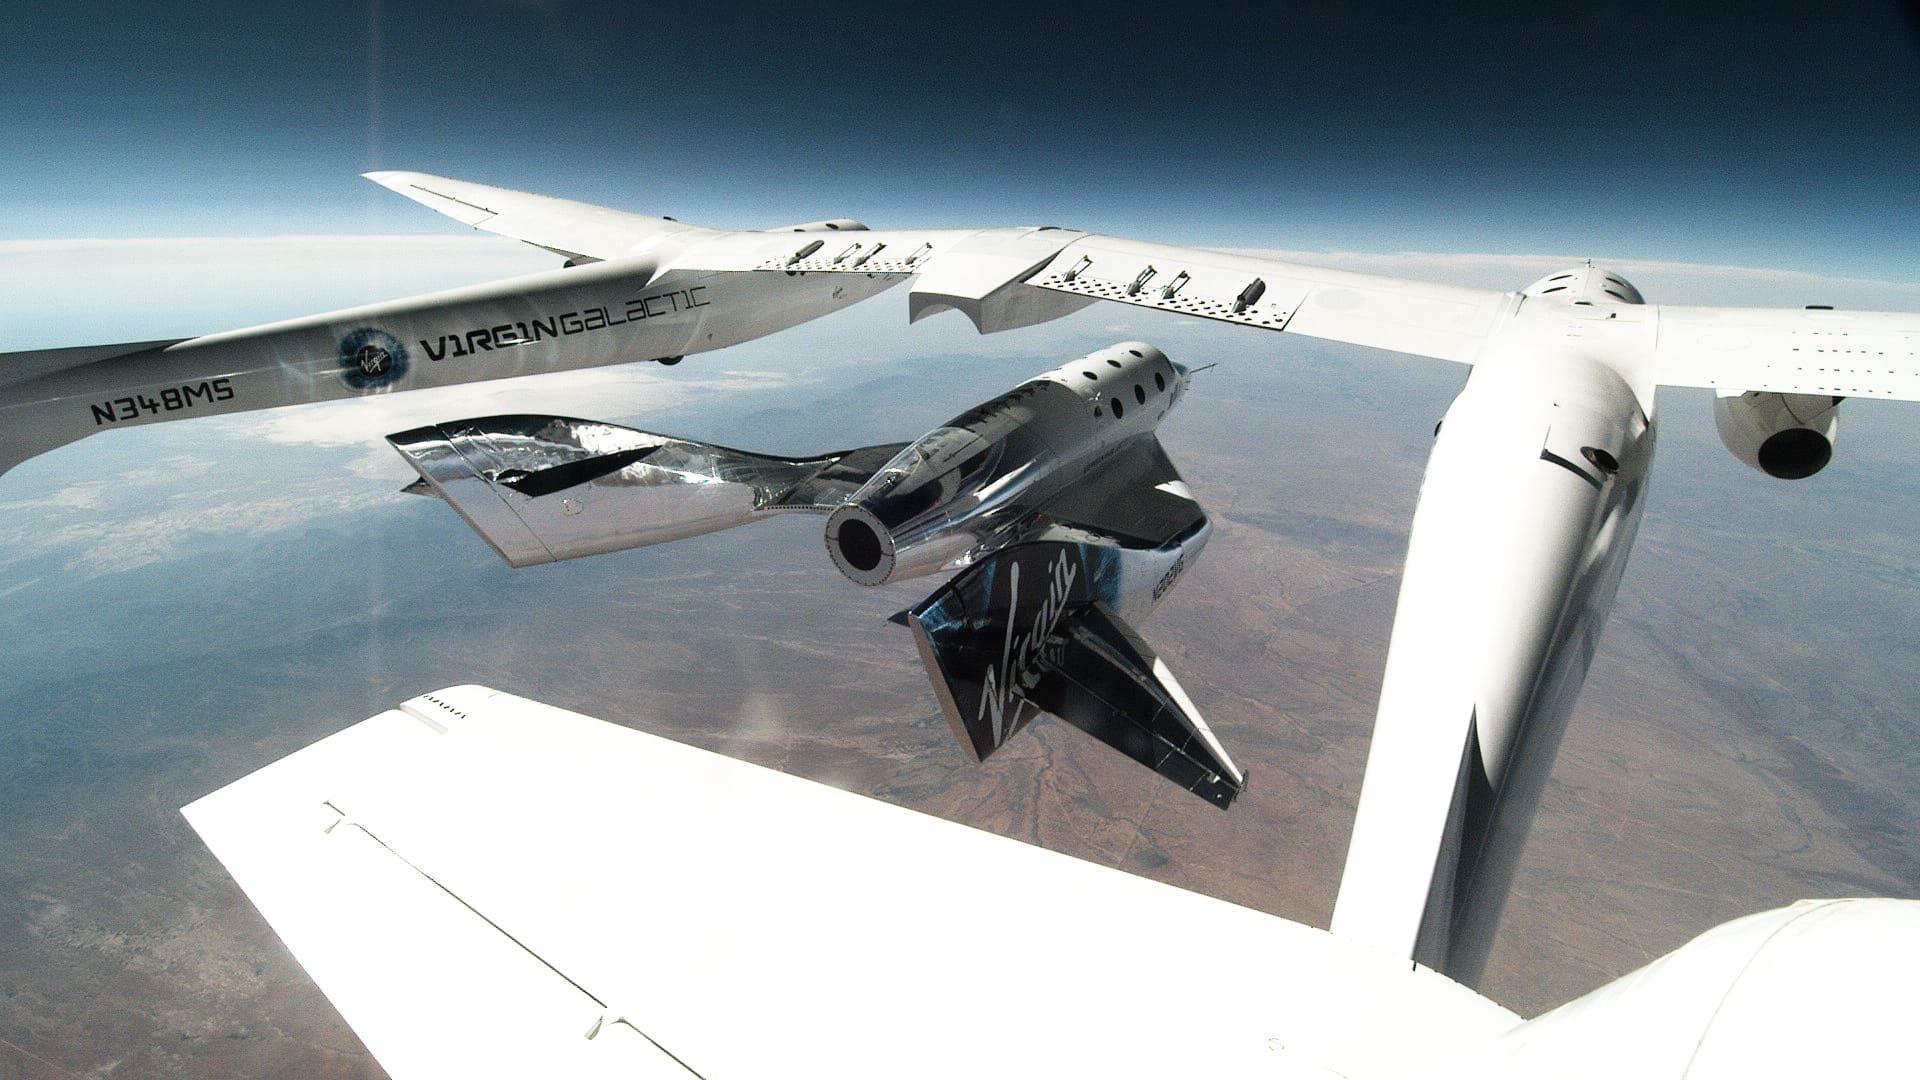 Virgin Galactic SPCE earnings Q1 2021 outcomes